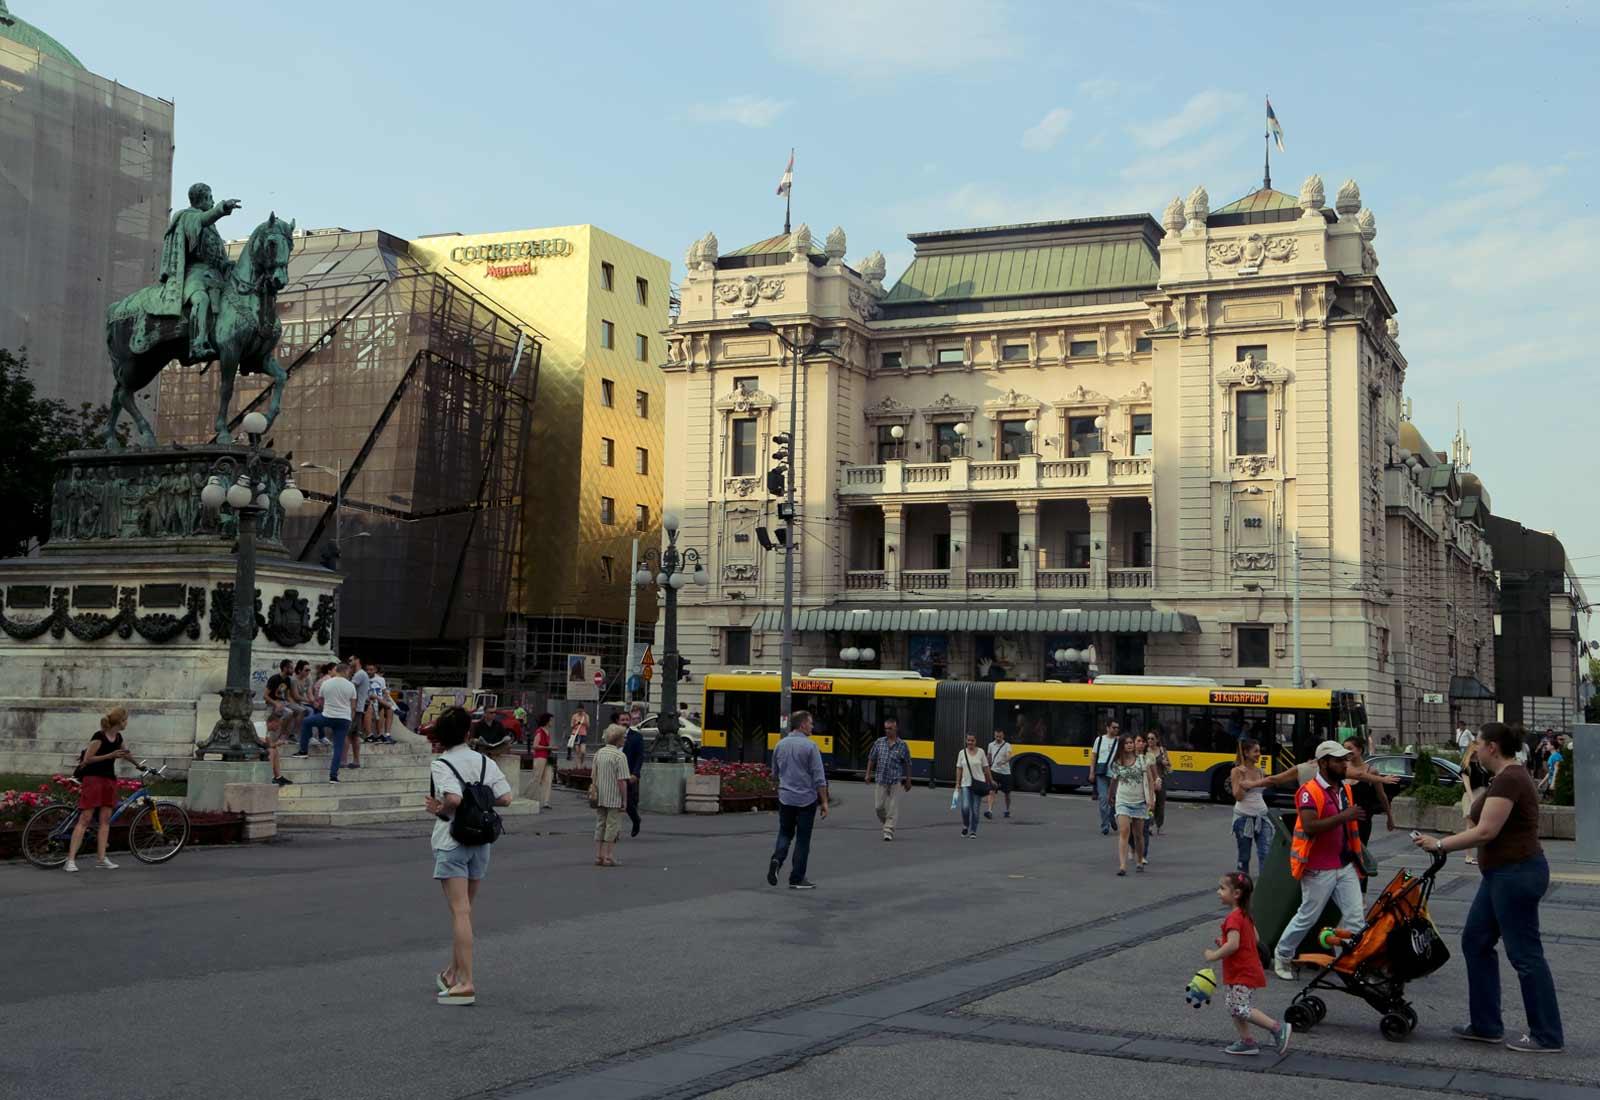 Central City Square